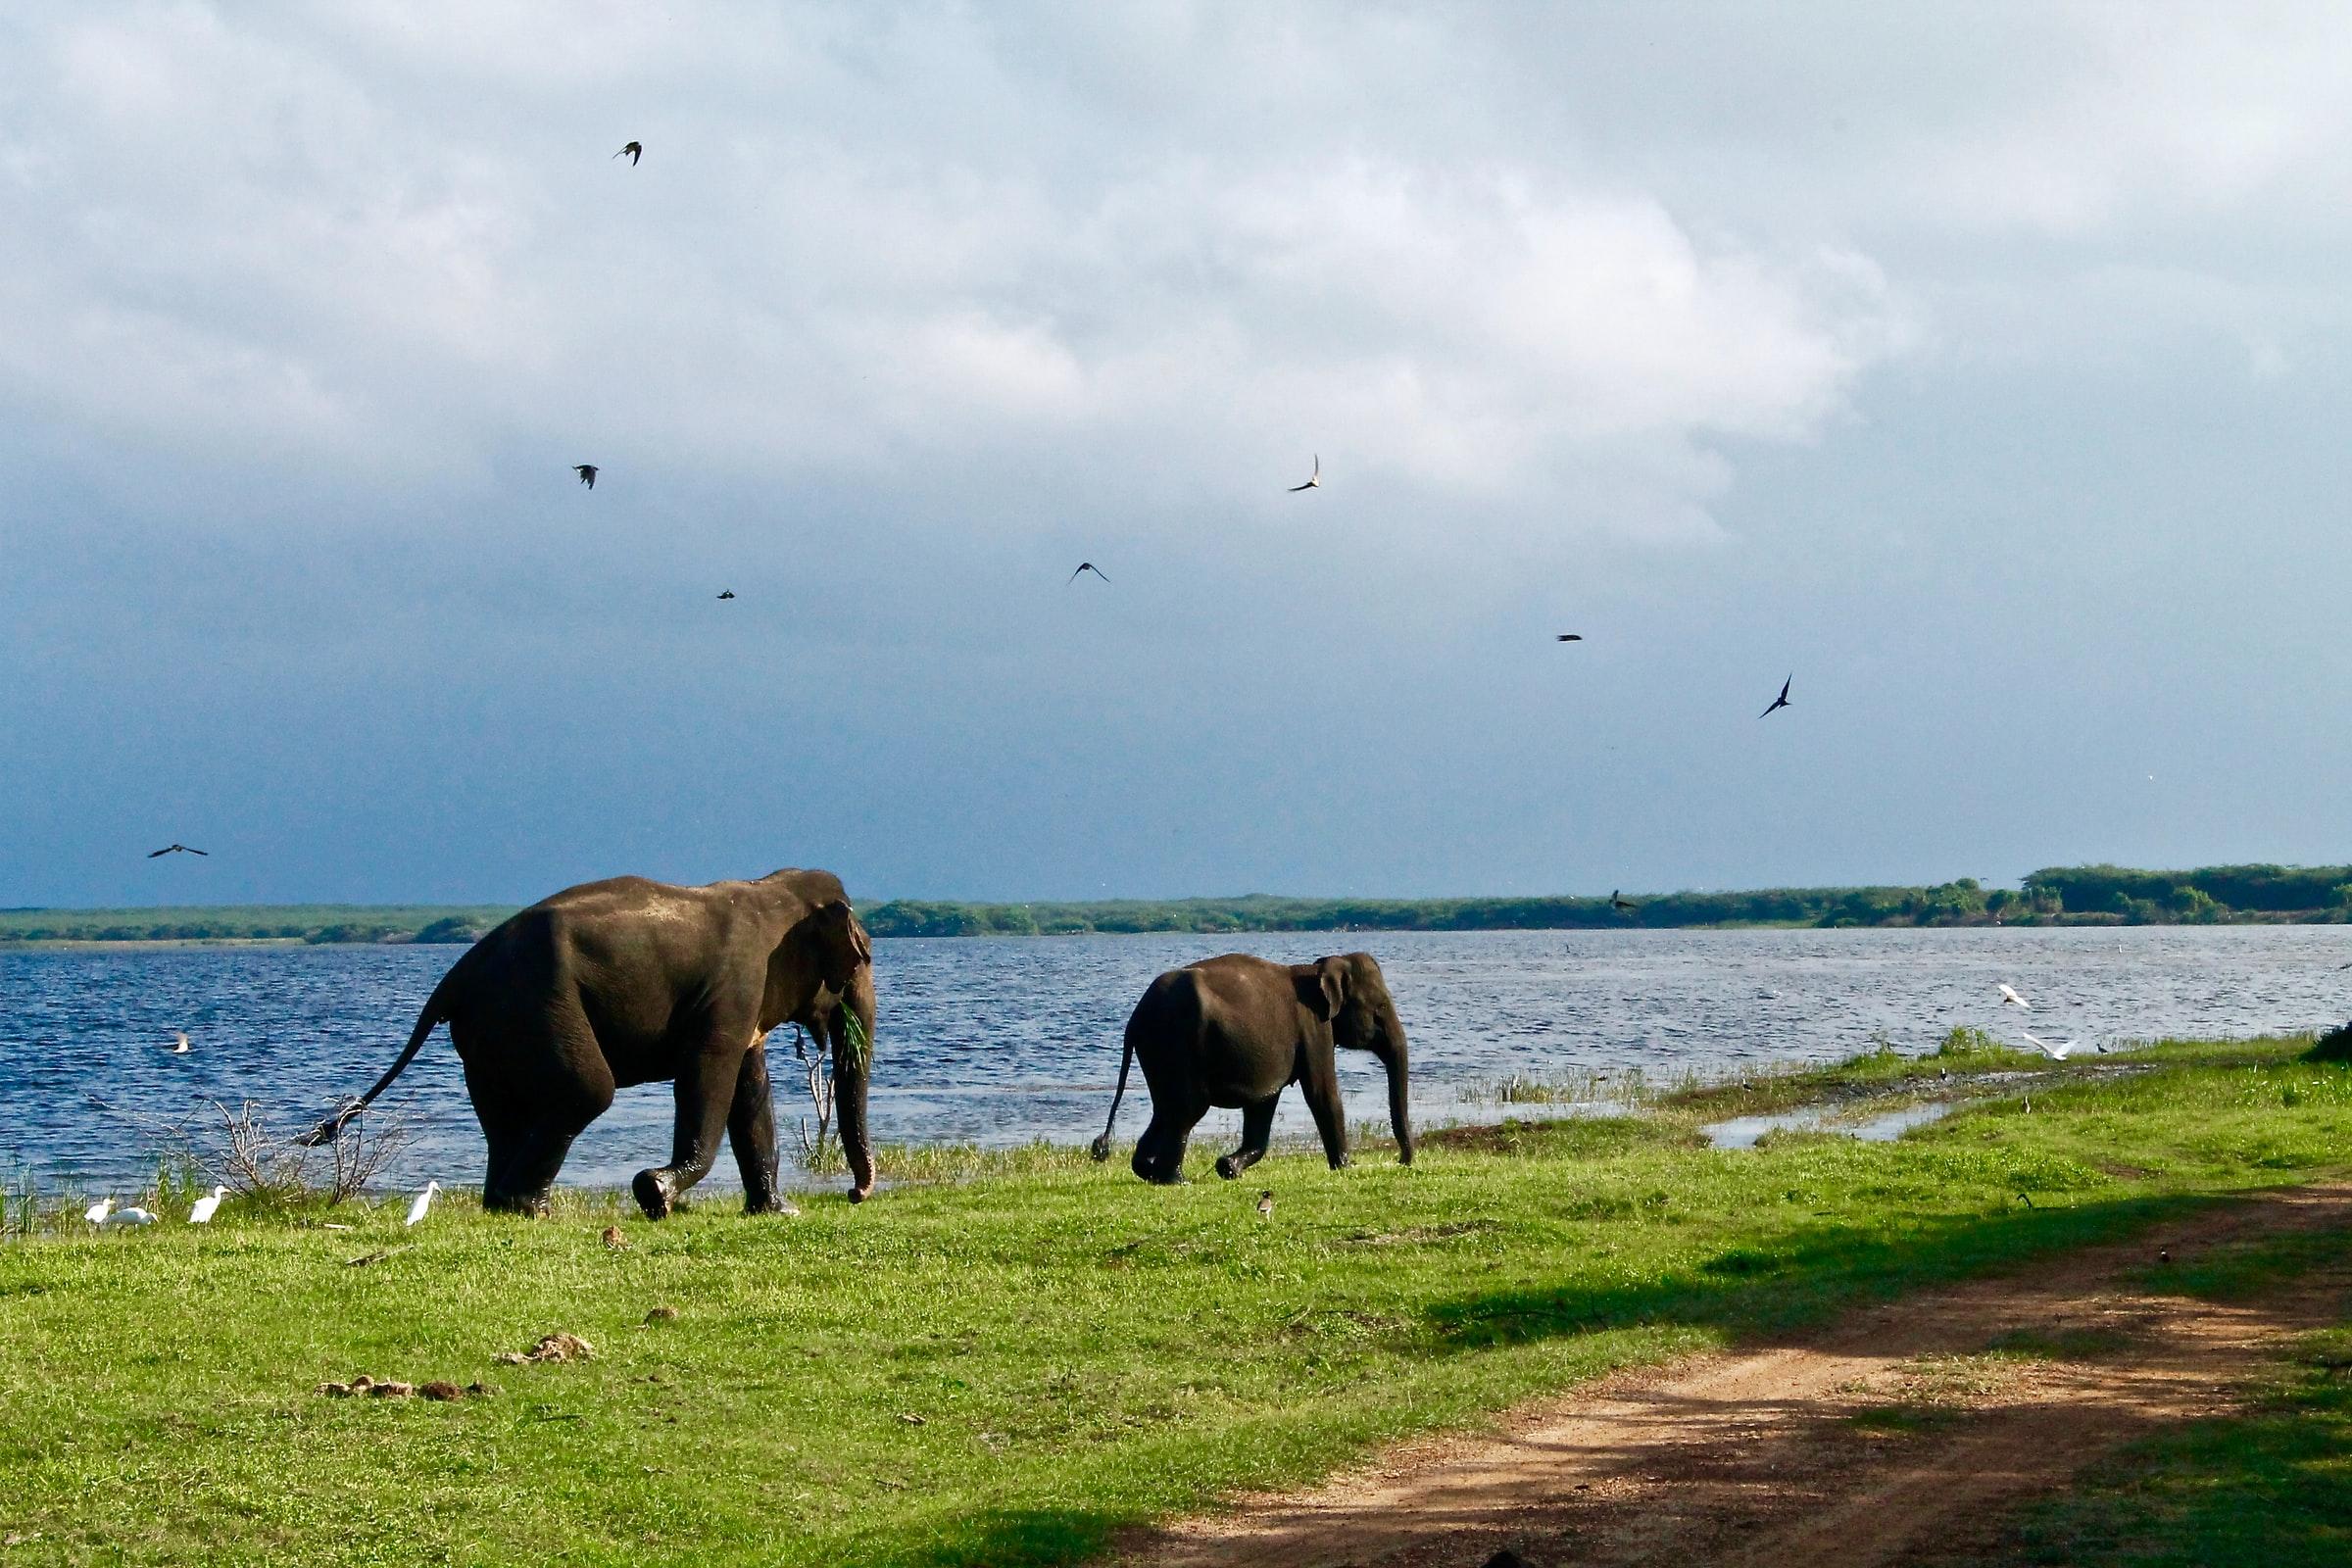 sri lanka opent grenzen toeristen